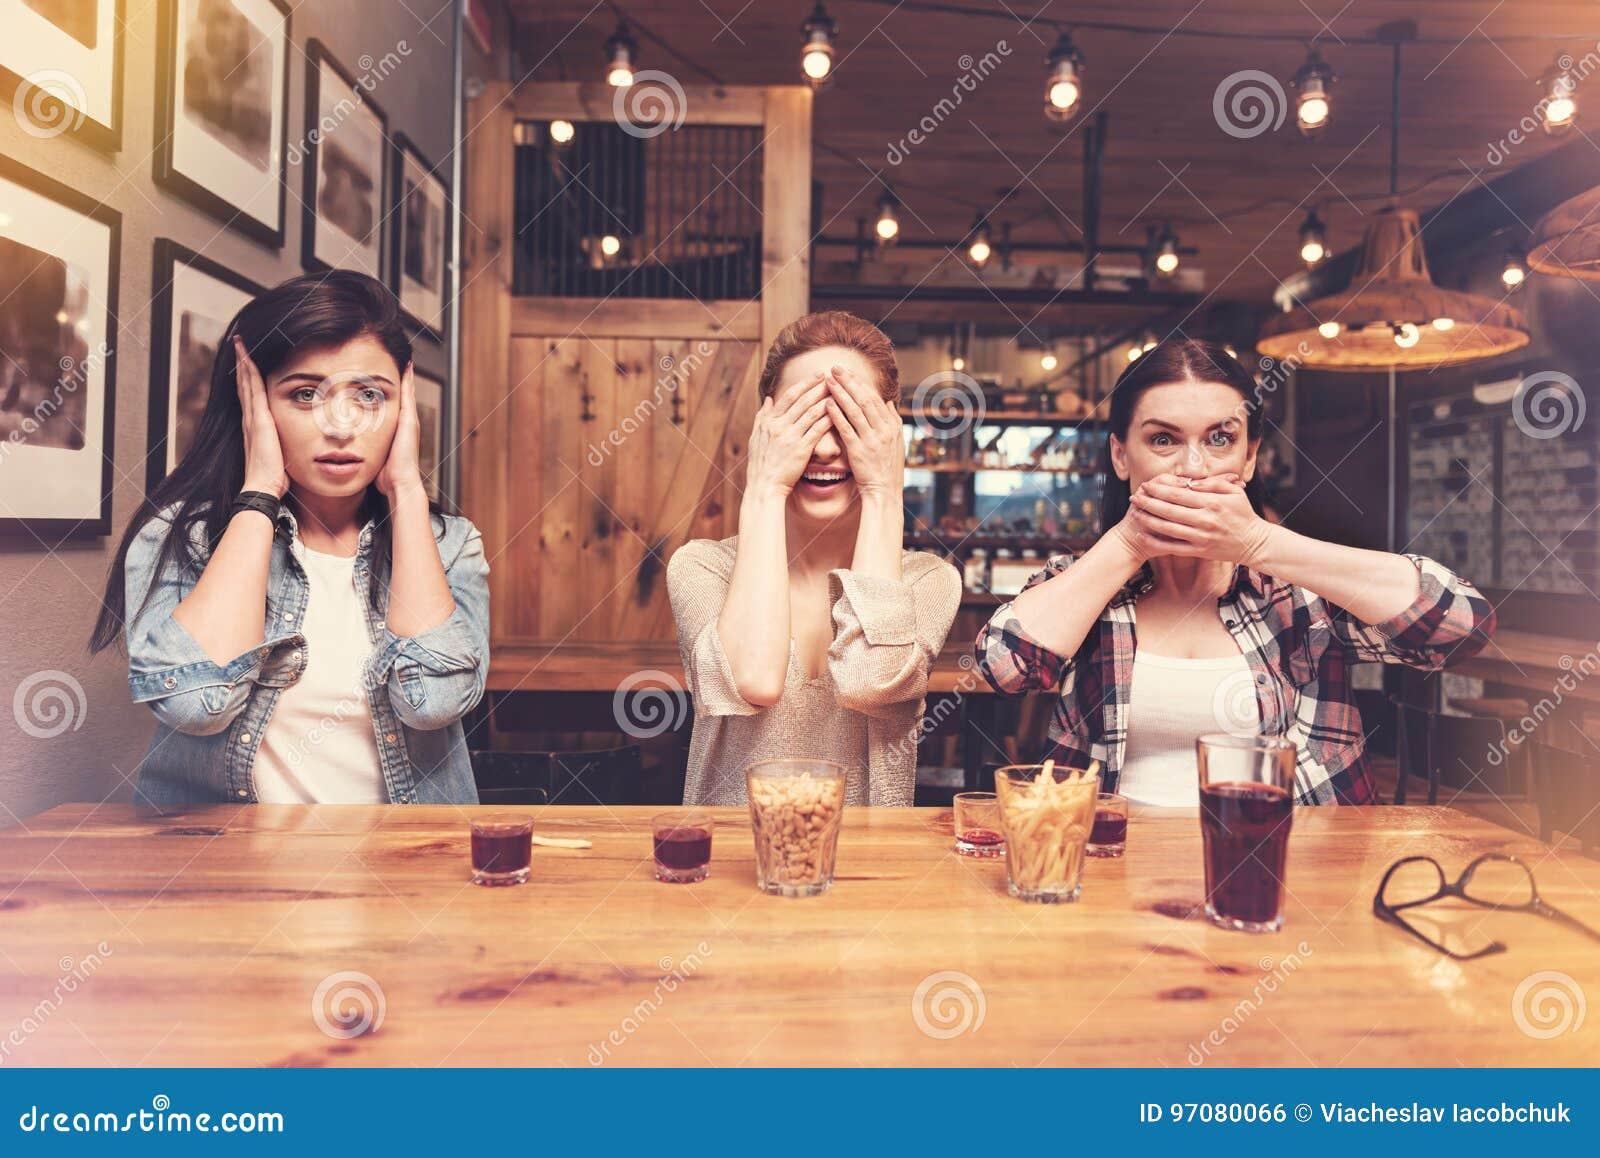 women hiding their faces Beautiful